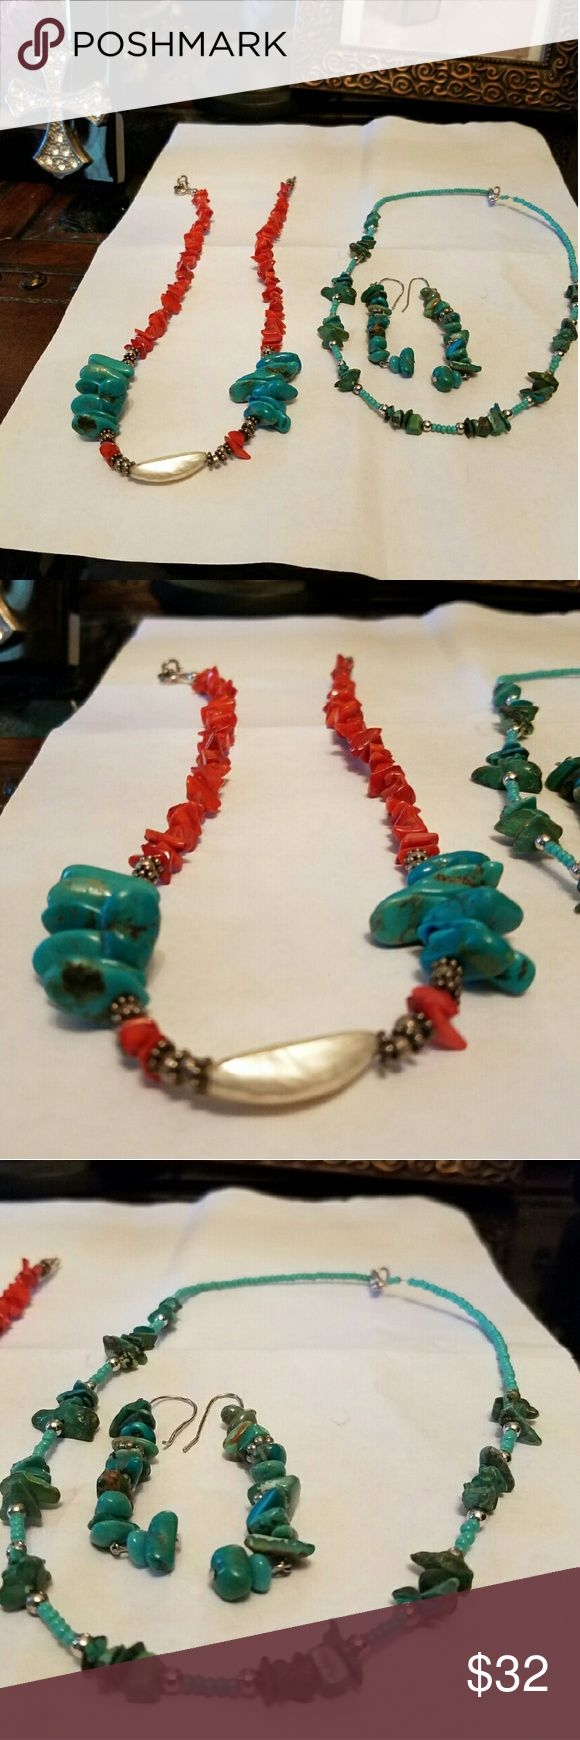 Pandora bracelet dillards - Barse Base And Turquoise Necklace W Earrings Barse Jewelrymother Pearl Dillardsturquoise